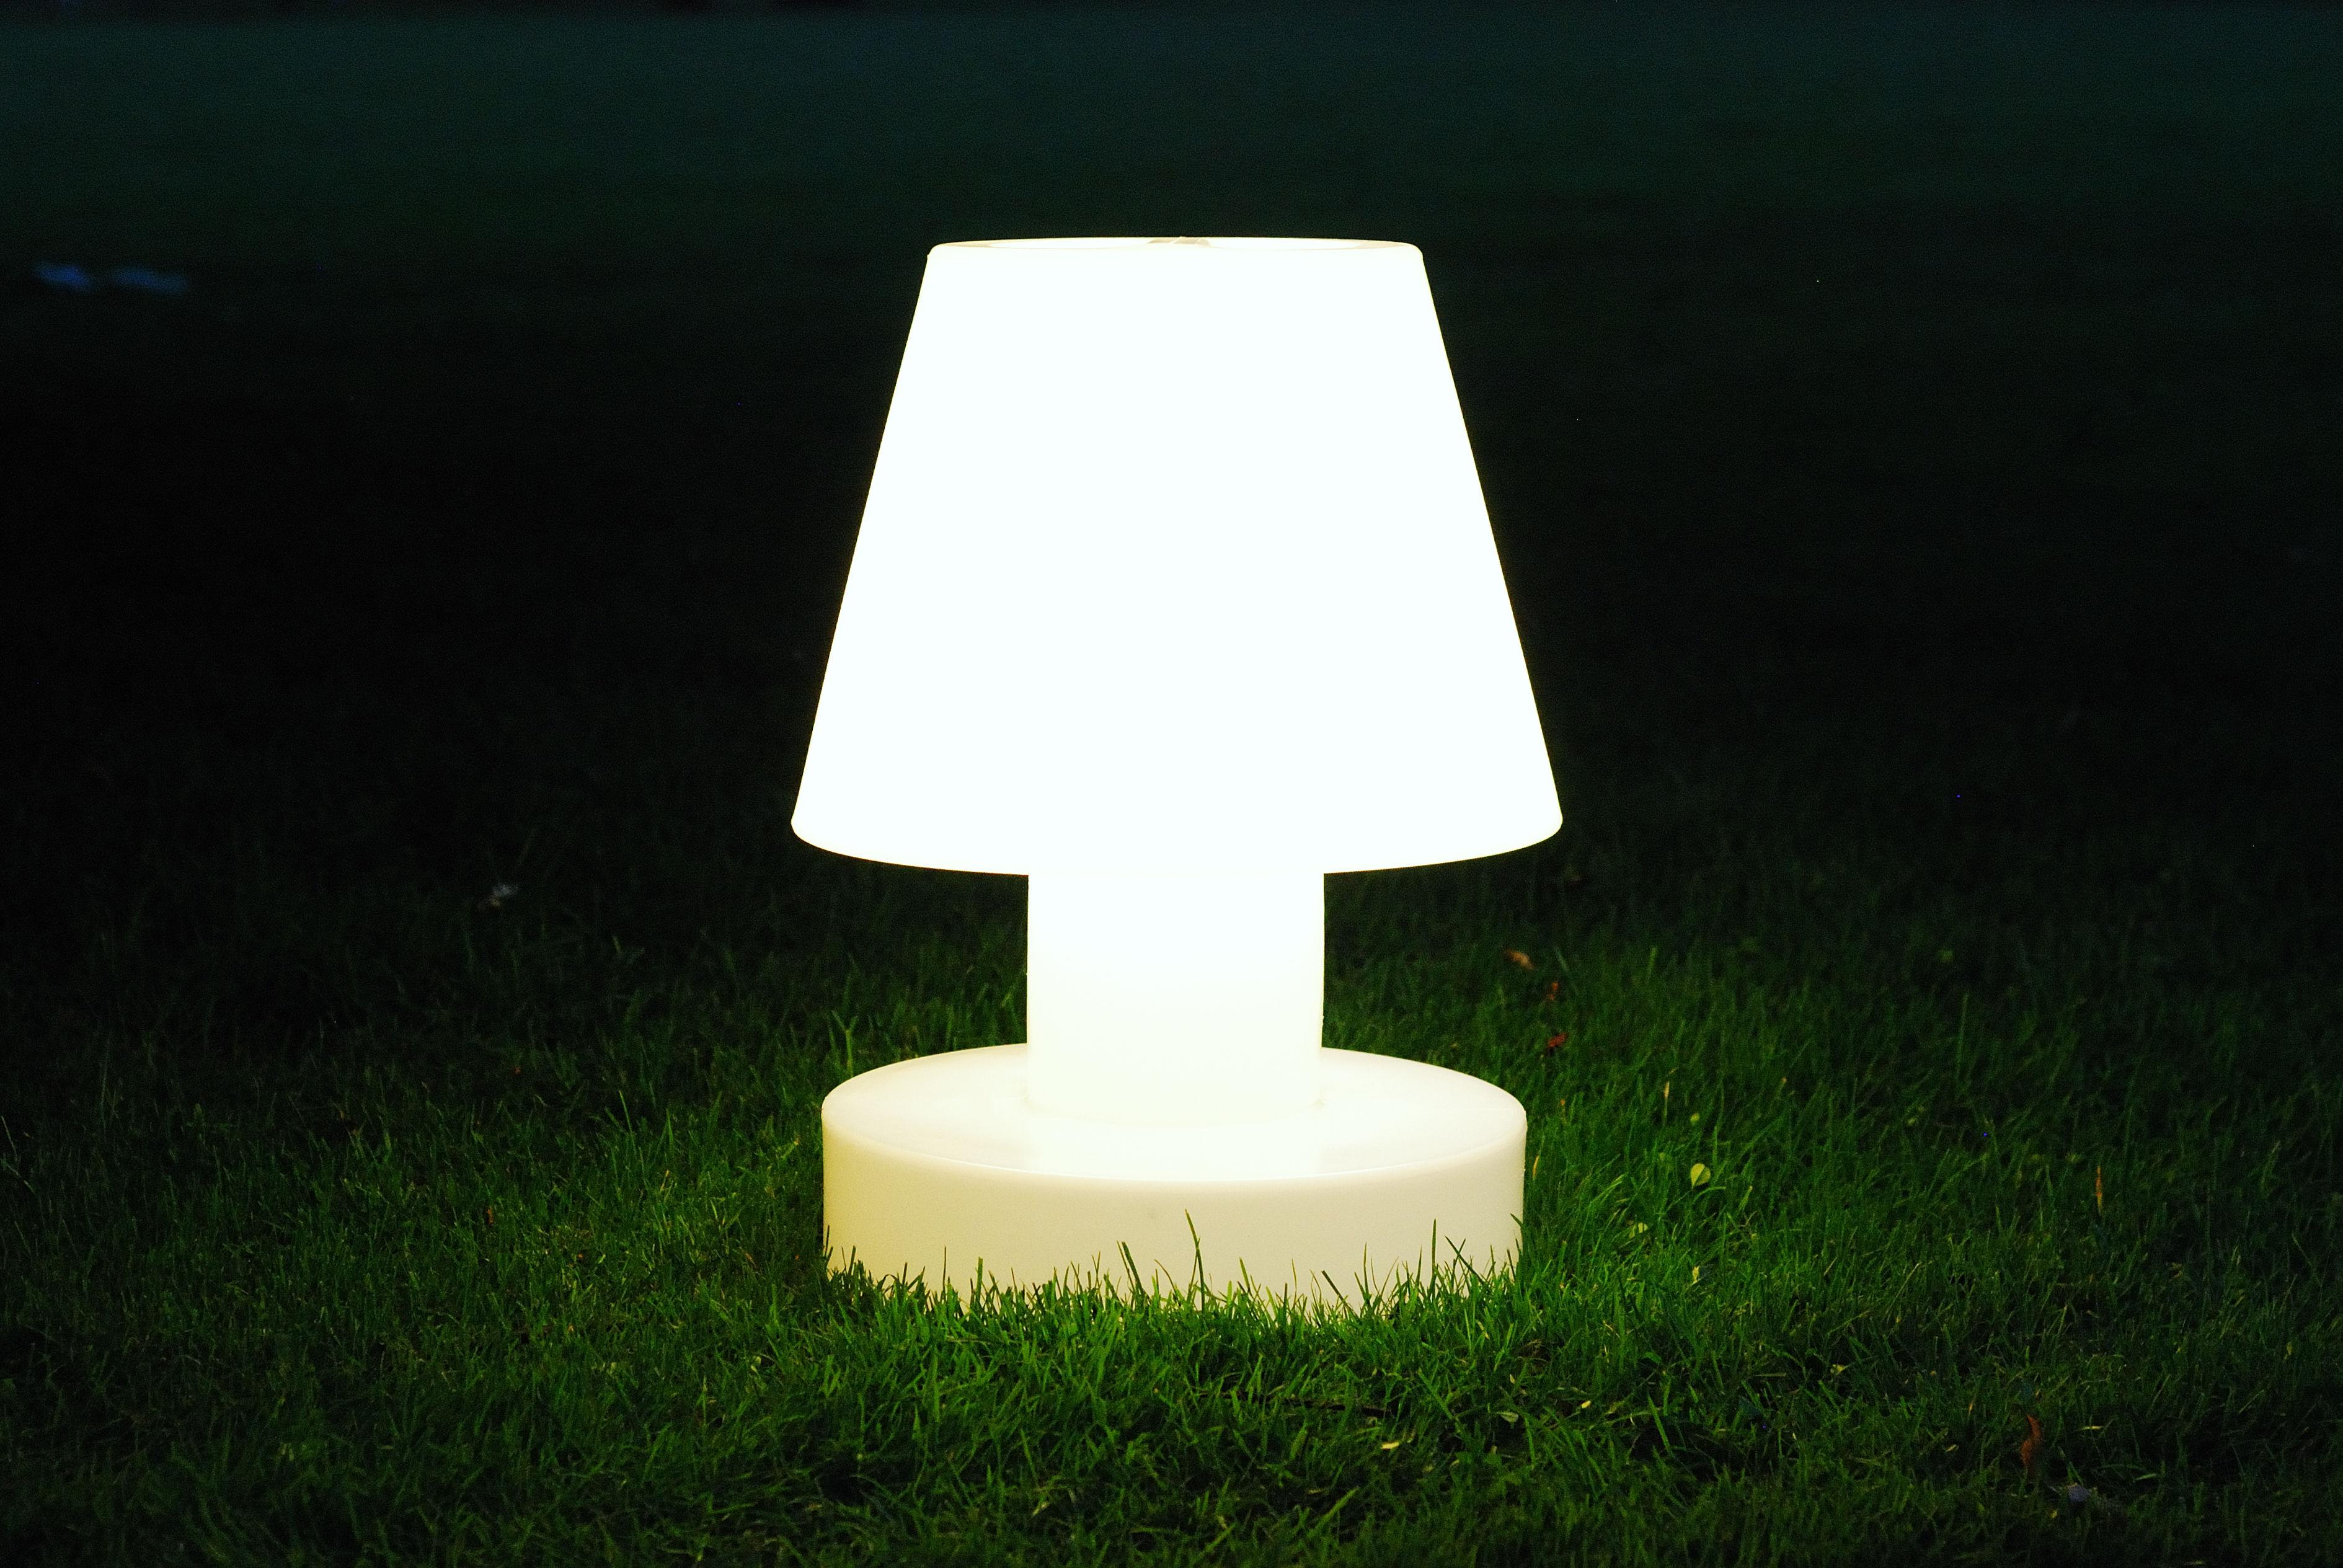 lampe sans fil rechargeable. Black Bedroom Furniture Sets. Home Design Ideas